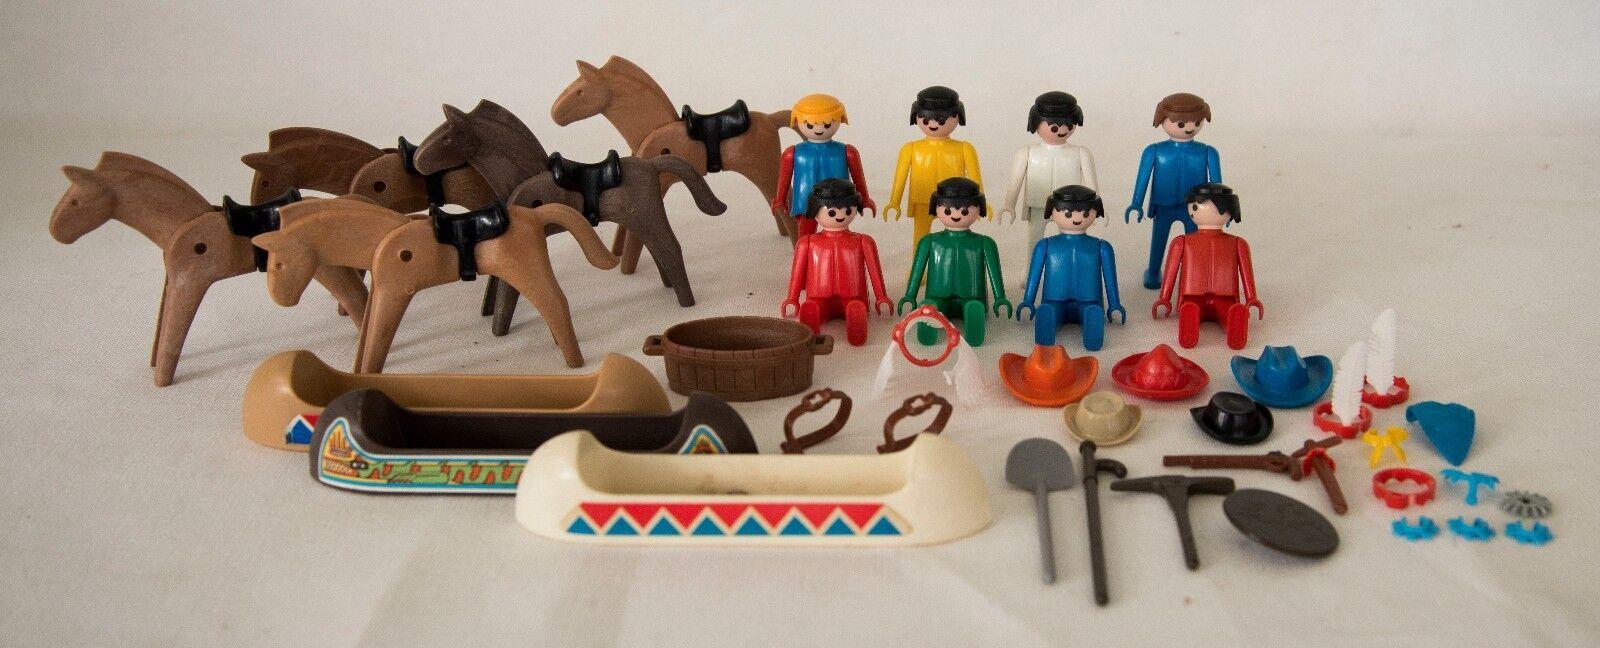 VINTAGE 1970's PLAYMOBIL GEOBRA MIXED MIXED MIXED LOT FIGURES-HORSES-CANOES +++ 9a32fe